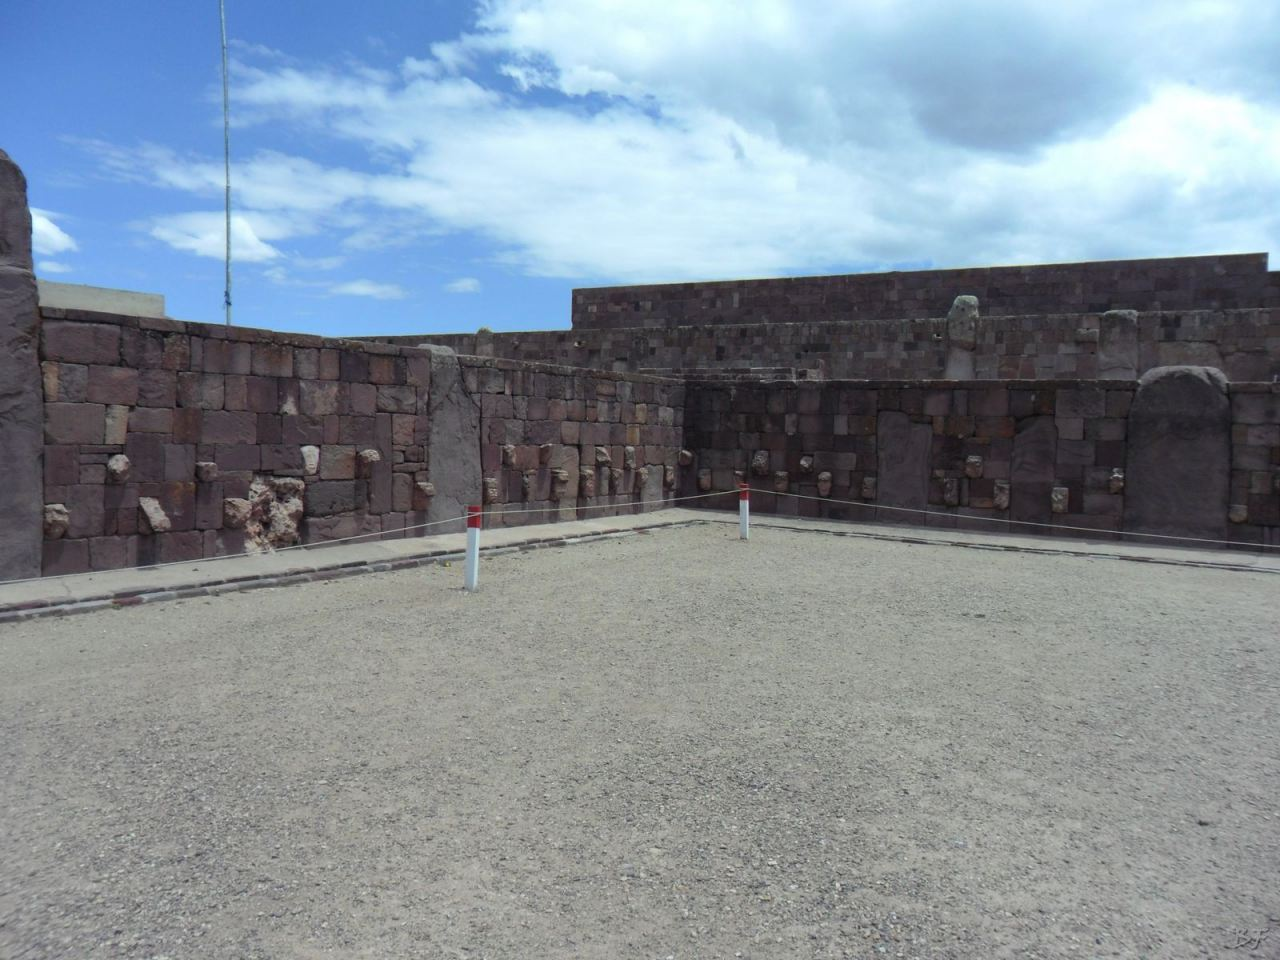 Sito-Megalitico-Piramide-Akapana-Kalasasaya-Menhir-Tiahuanaco-Bolivia-79